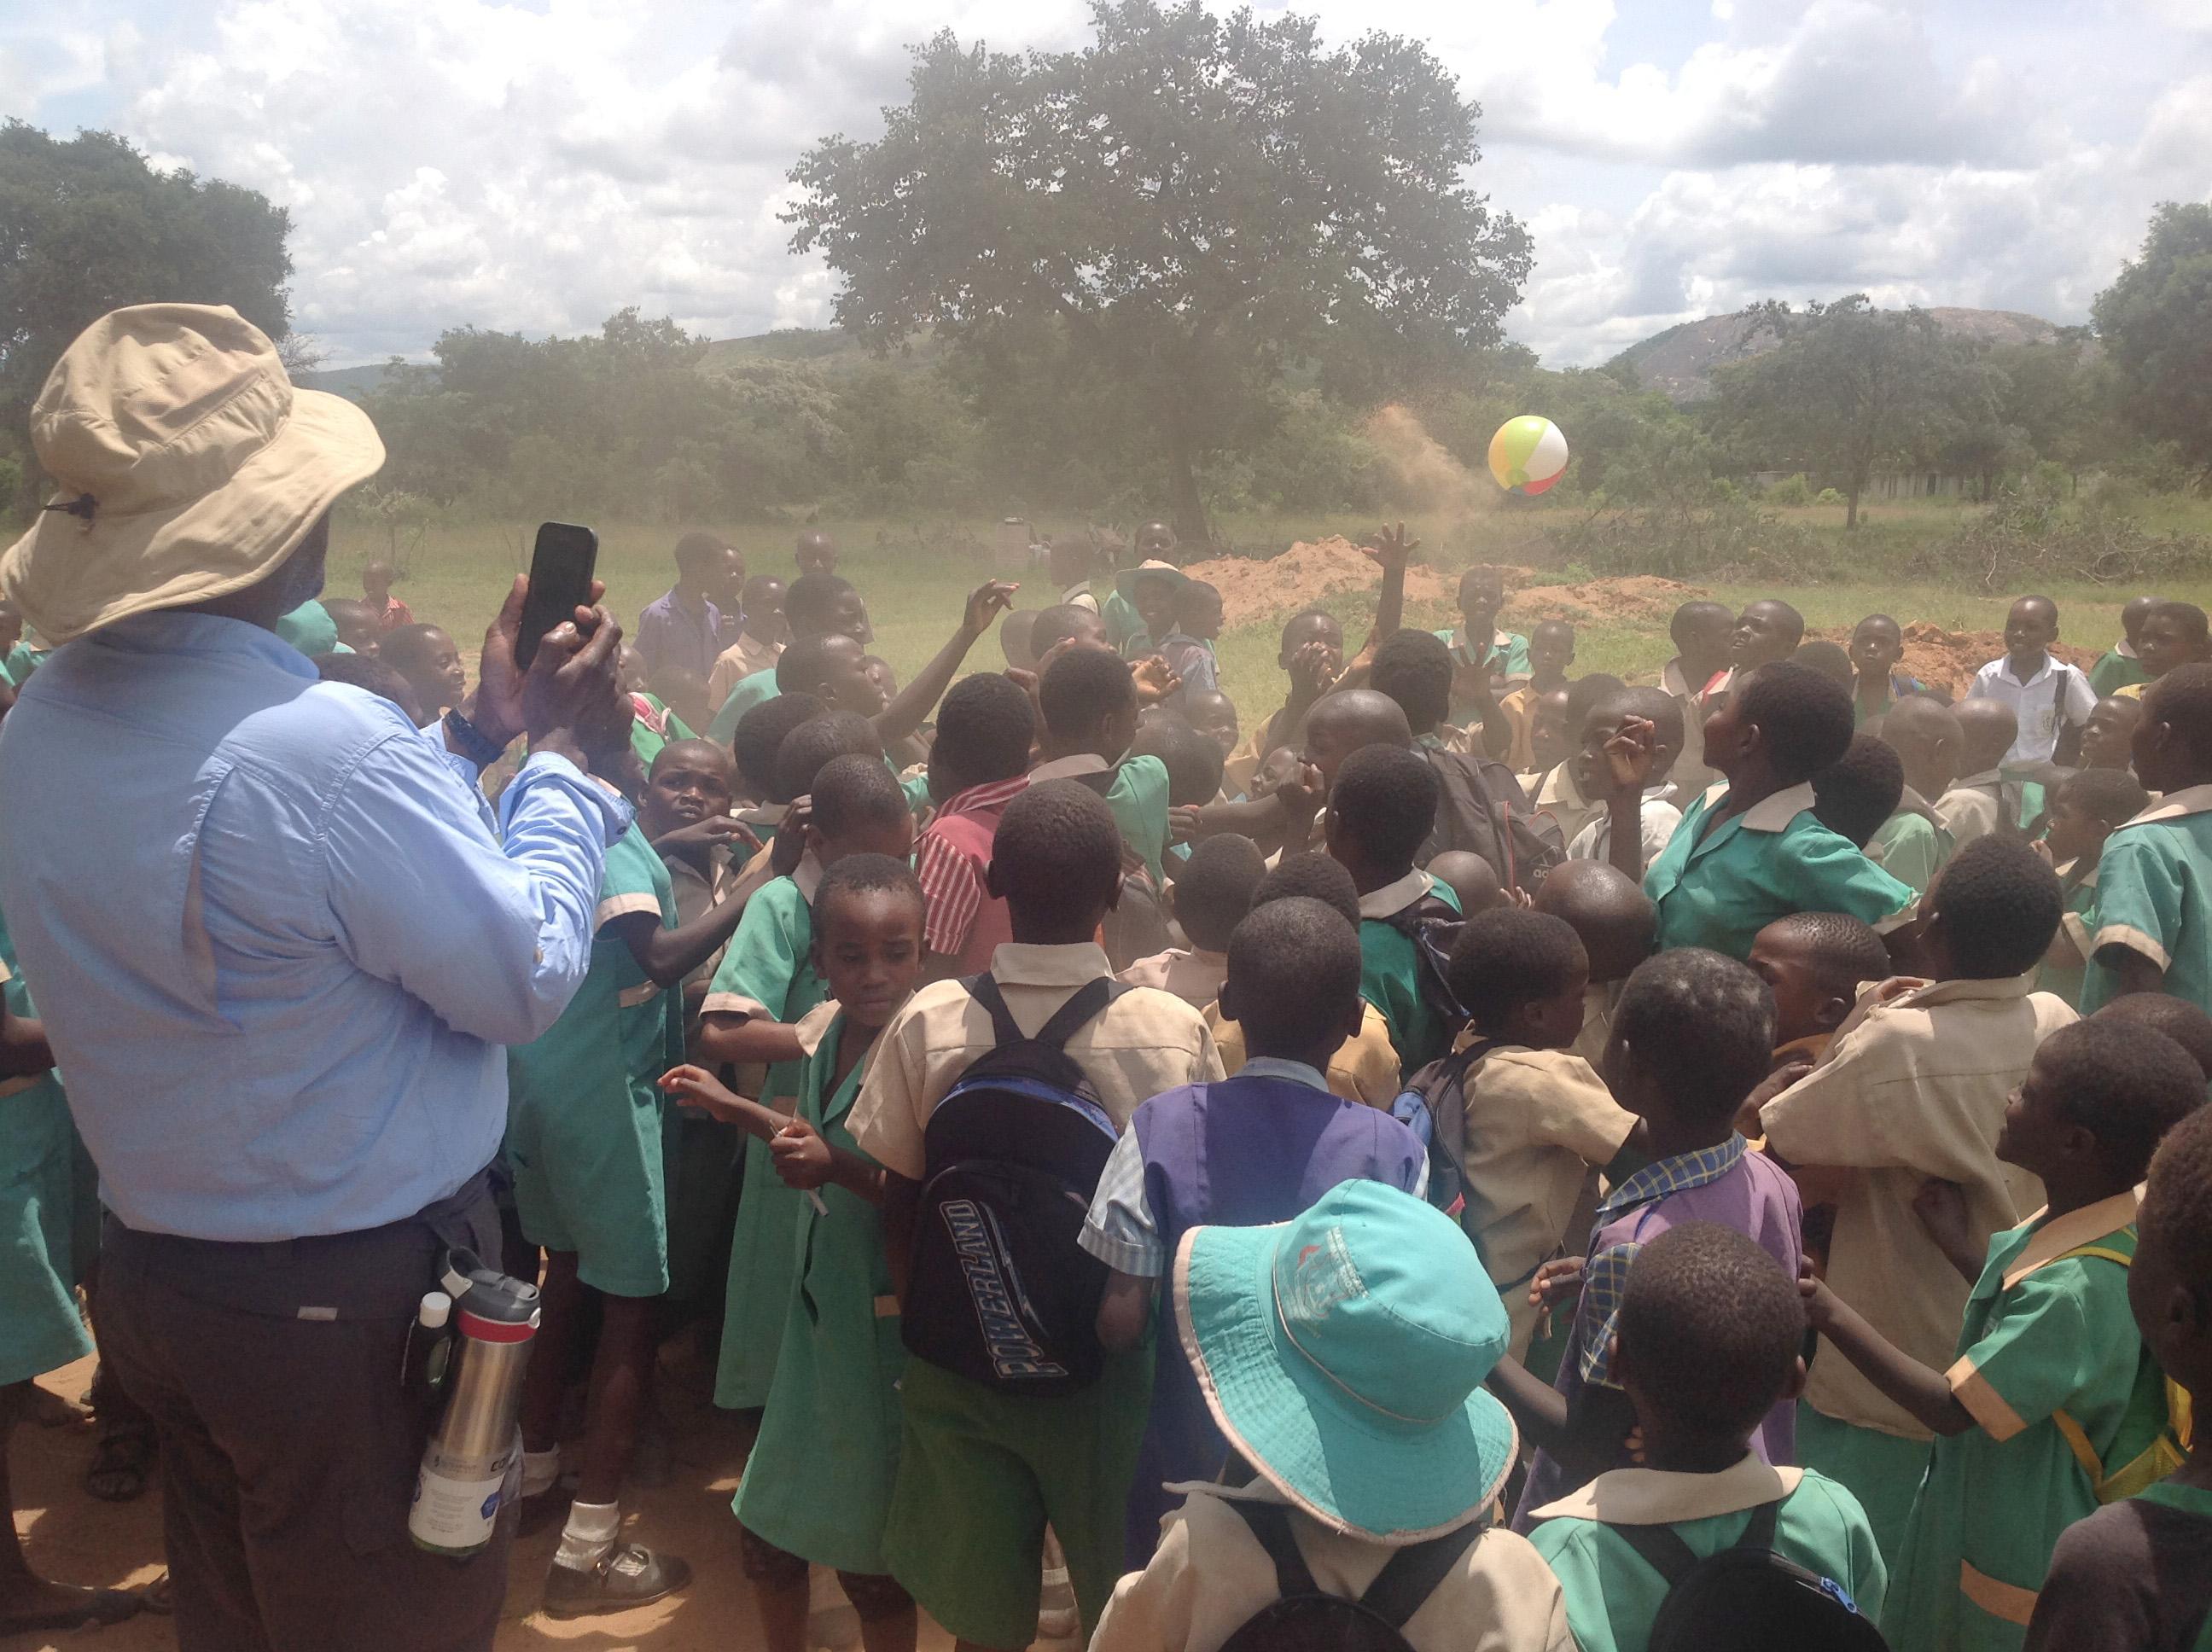 Students play outside Mashambanhaka Secondary School in Murewa, Zimbabwe. The school recently celebrated the construction of two classroom blocks by Community United Methodist Church in Crofton, Md. Photo by Eveline Chikwanah